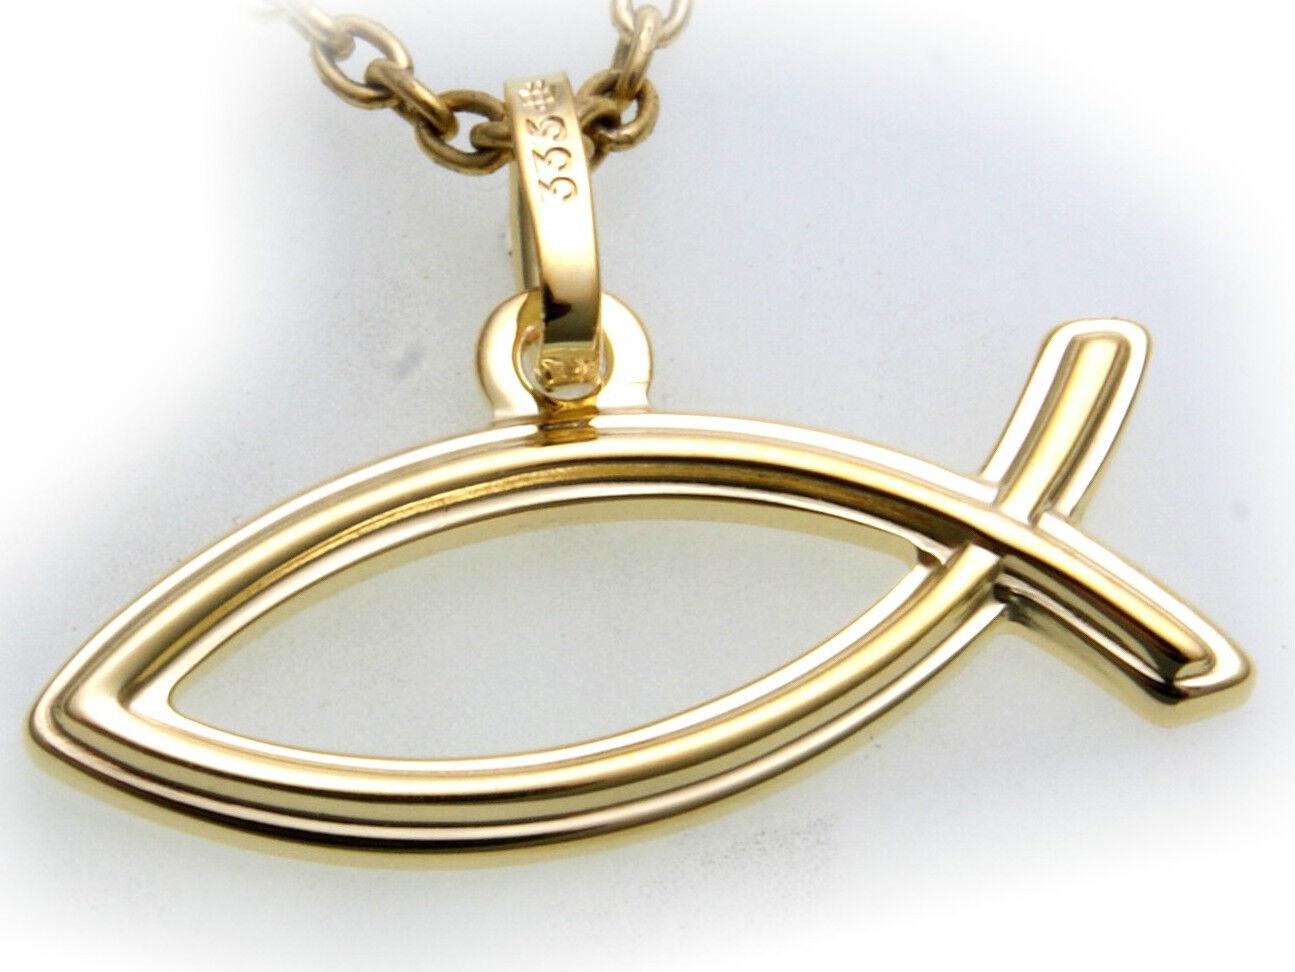 Colgante Ychthis gold Real 333 8kt yellow Superior Macizo Pez Cristianismo